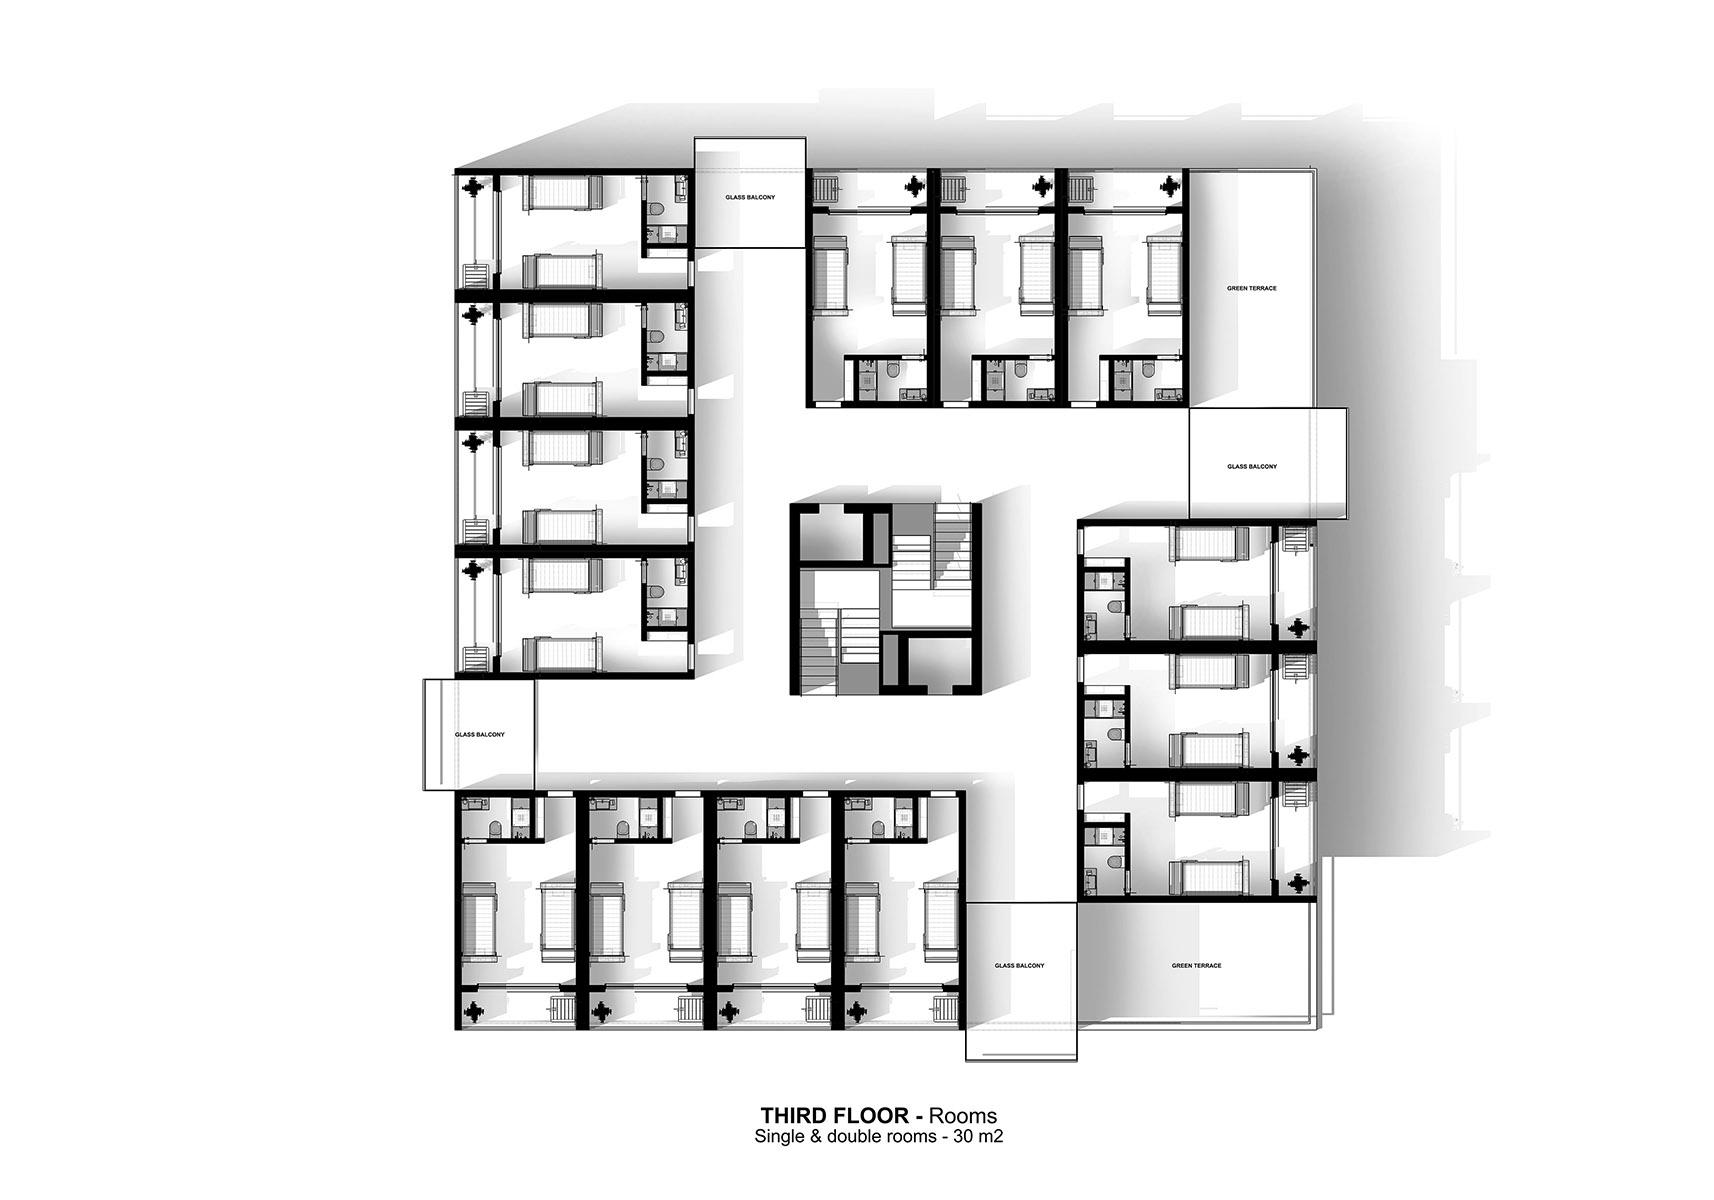 Genoa - A G Tehrani Design Studio - 08 - Section